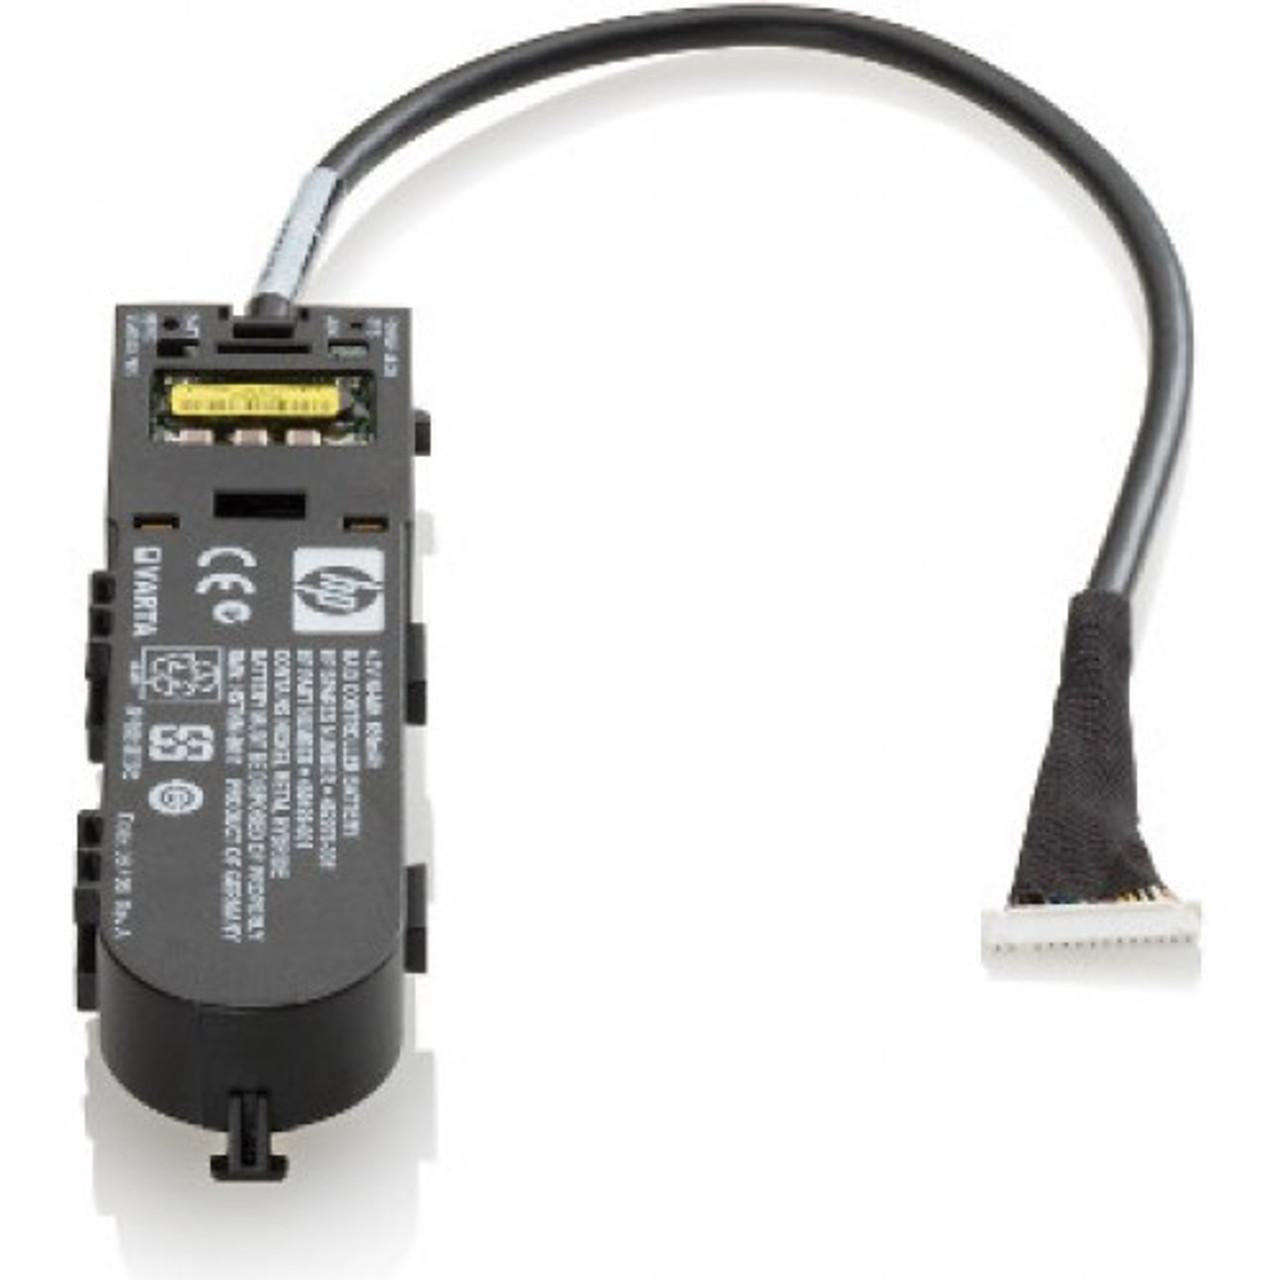 011668-001 - HP 4.8v 360mah Bbwc Enabler for Smart Array 5i Plus Controller